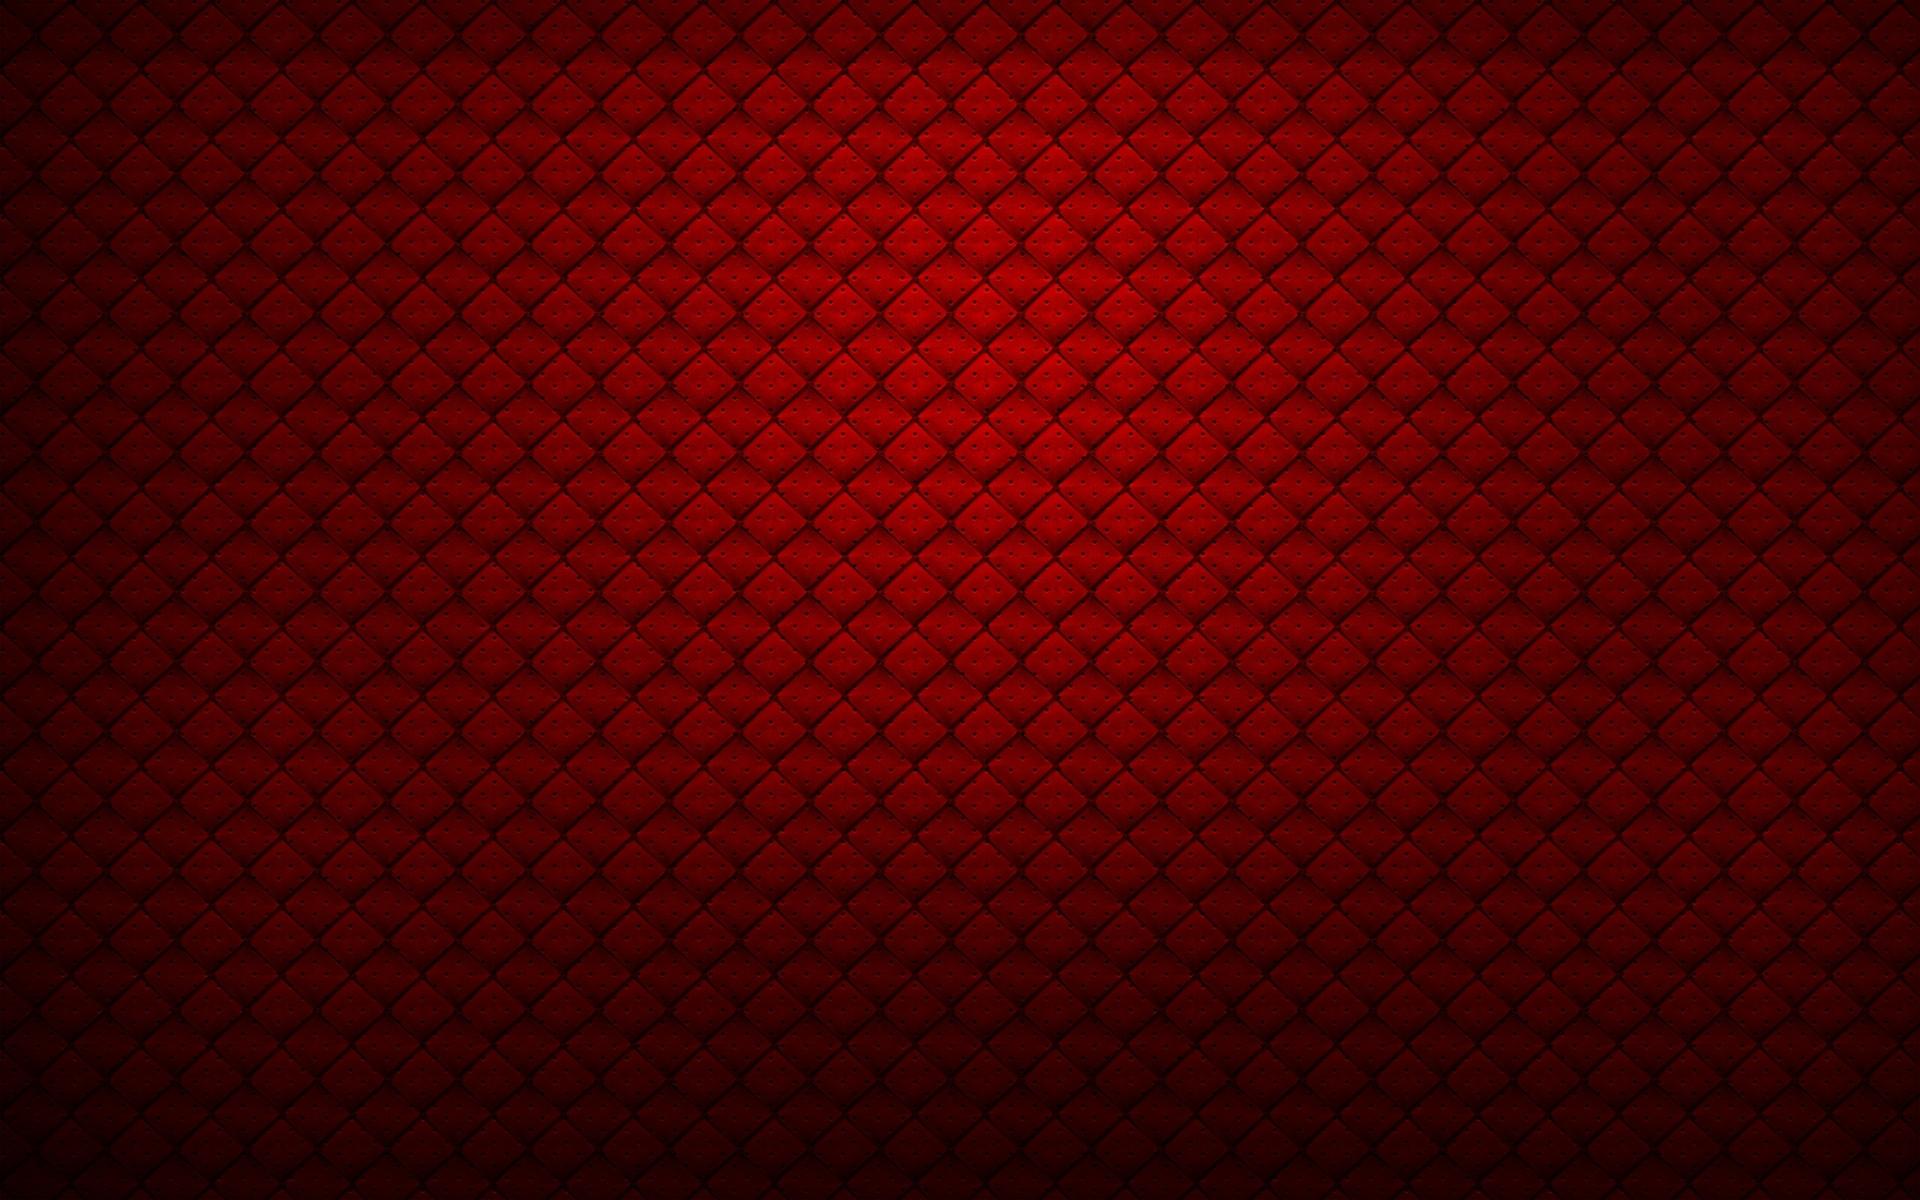 Guitar Hd Wallpapers 1080p Daft Punk Typography Music Artwork Wallpaper 2560x1600